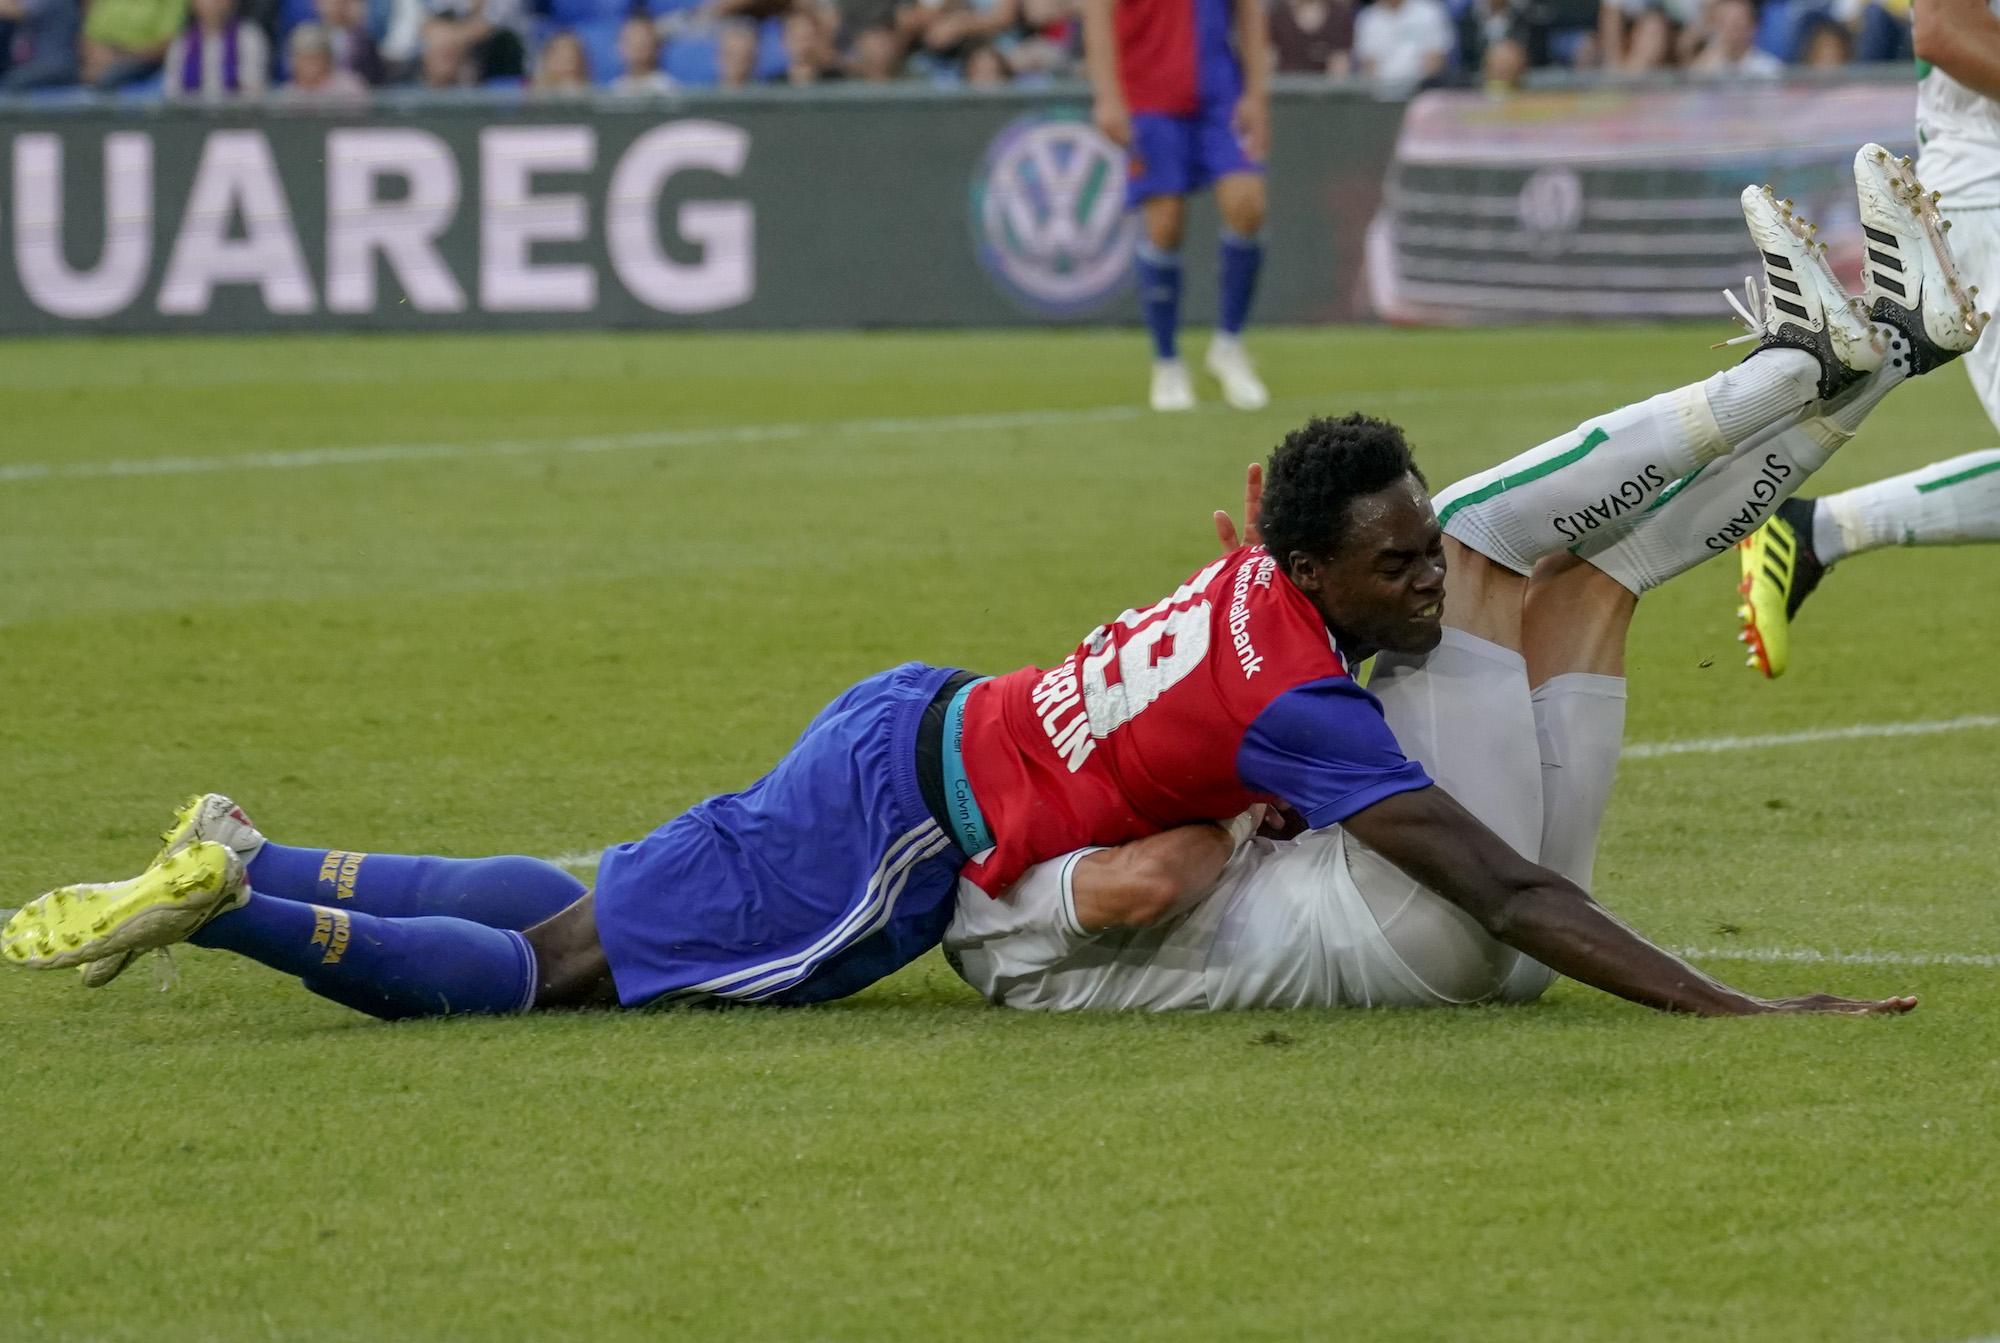 21.07.2018; Basel; FUSSBALL SUPER LEAGUE - FC Basel - FC St.Gallen;Bruchlandung fuer Dimitri Oberlin (Basel) gegen Jordi Qui